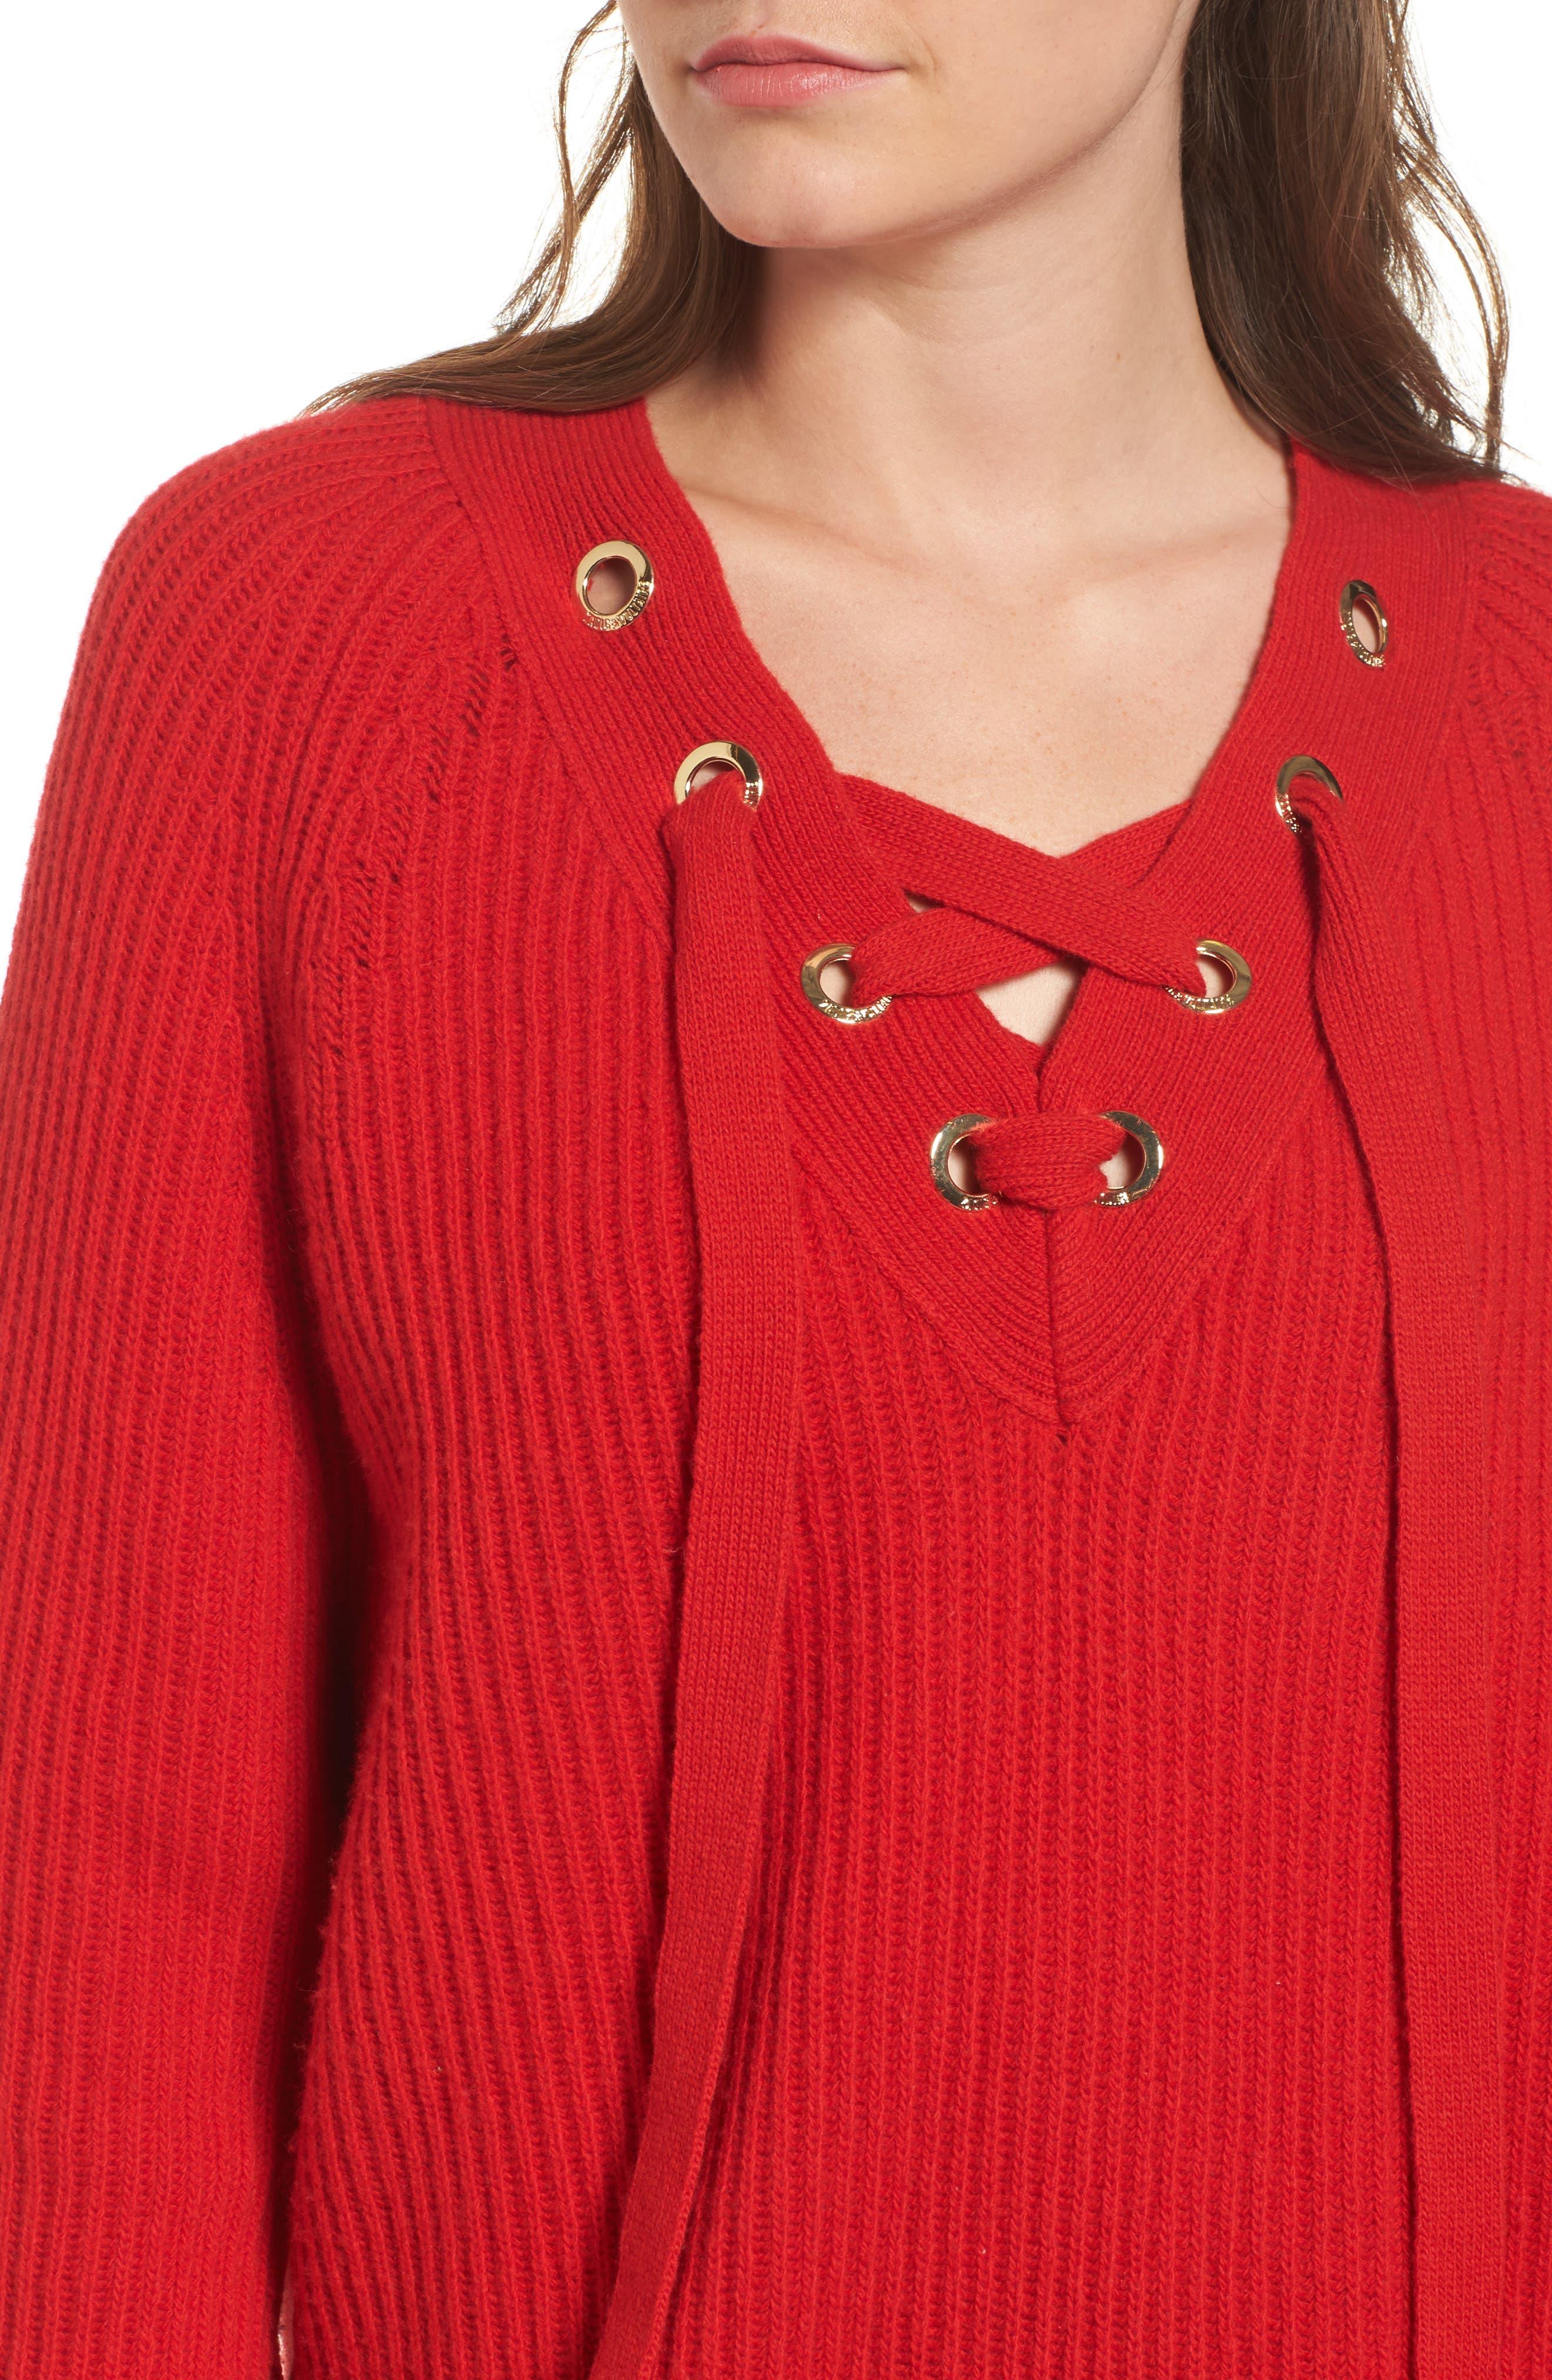 Kassy Wool Blend Sweater,                             Alternate thumbnail 4, color,                             600